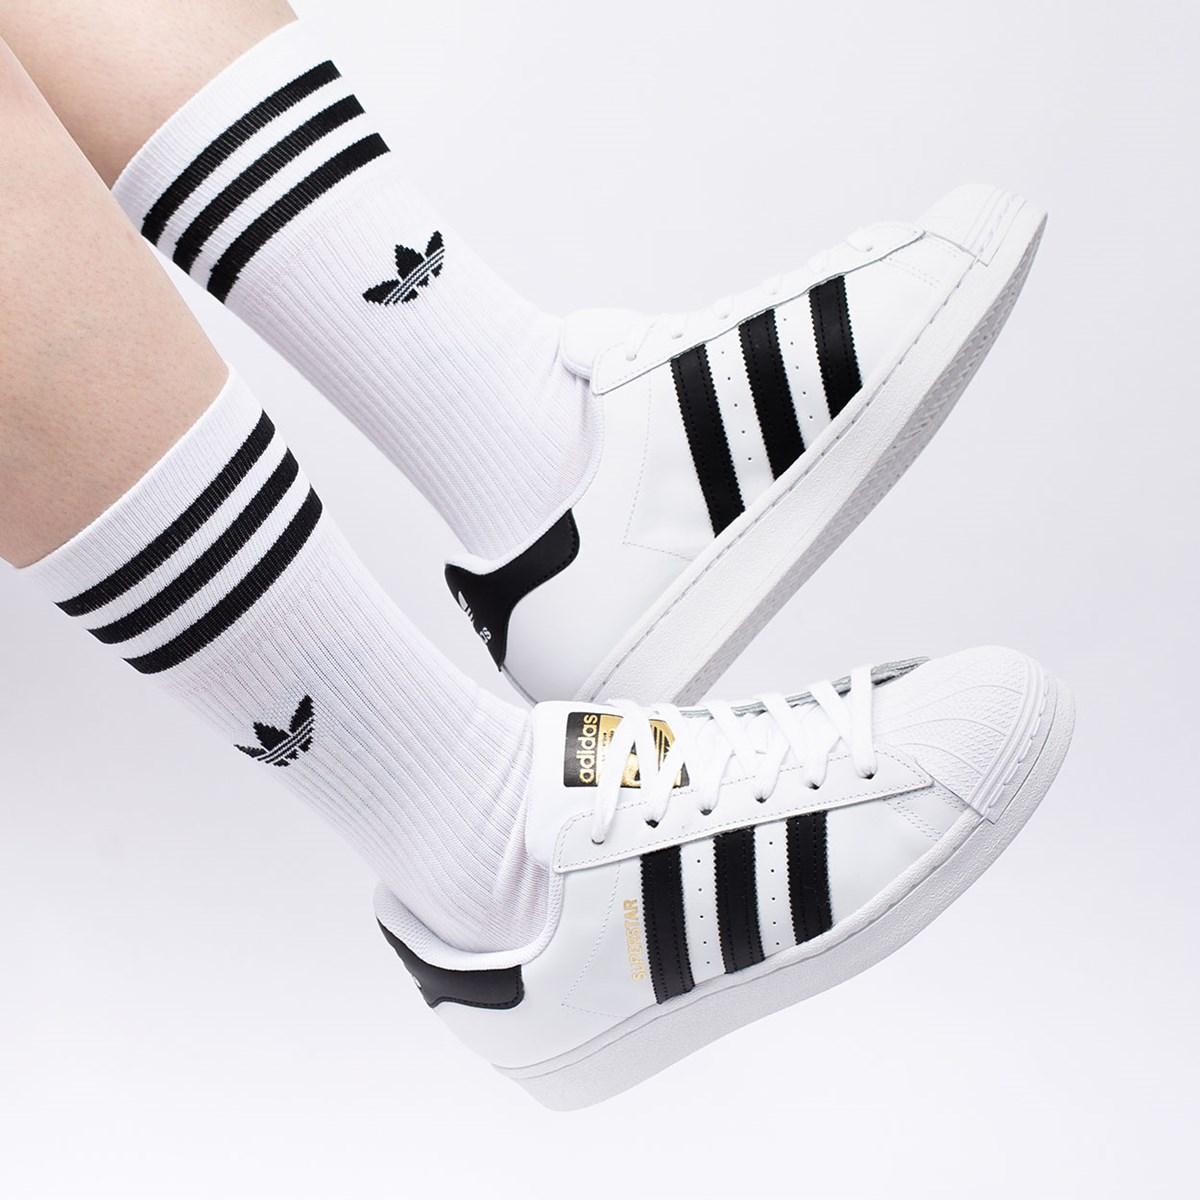 Meia Adidas Feminina Solid Crew Sock Kit 3 Pares White S21489